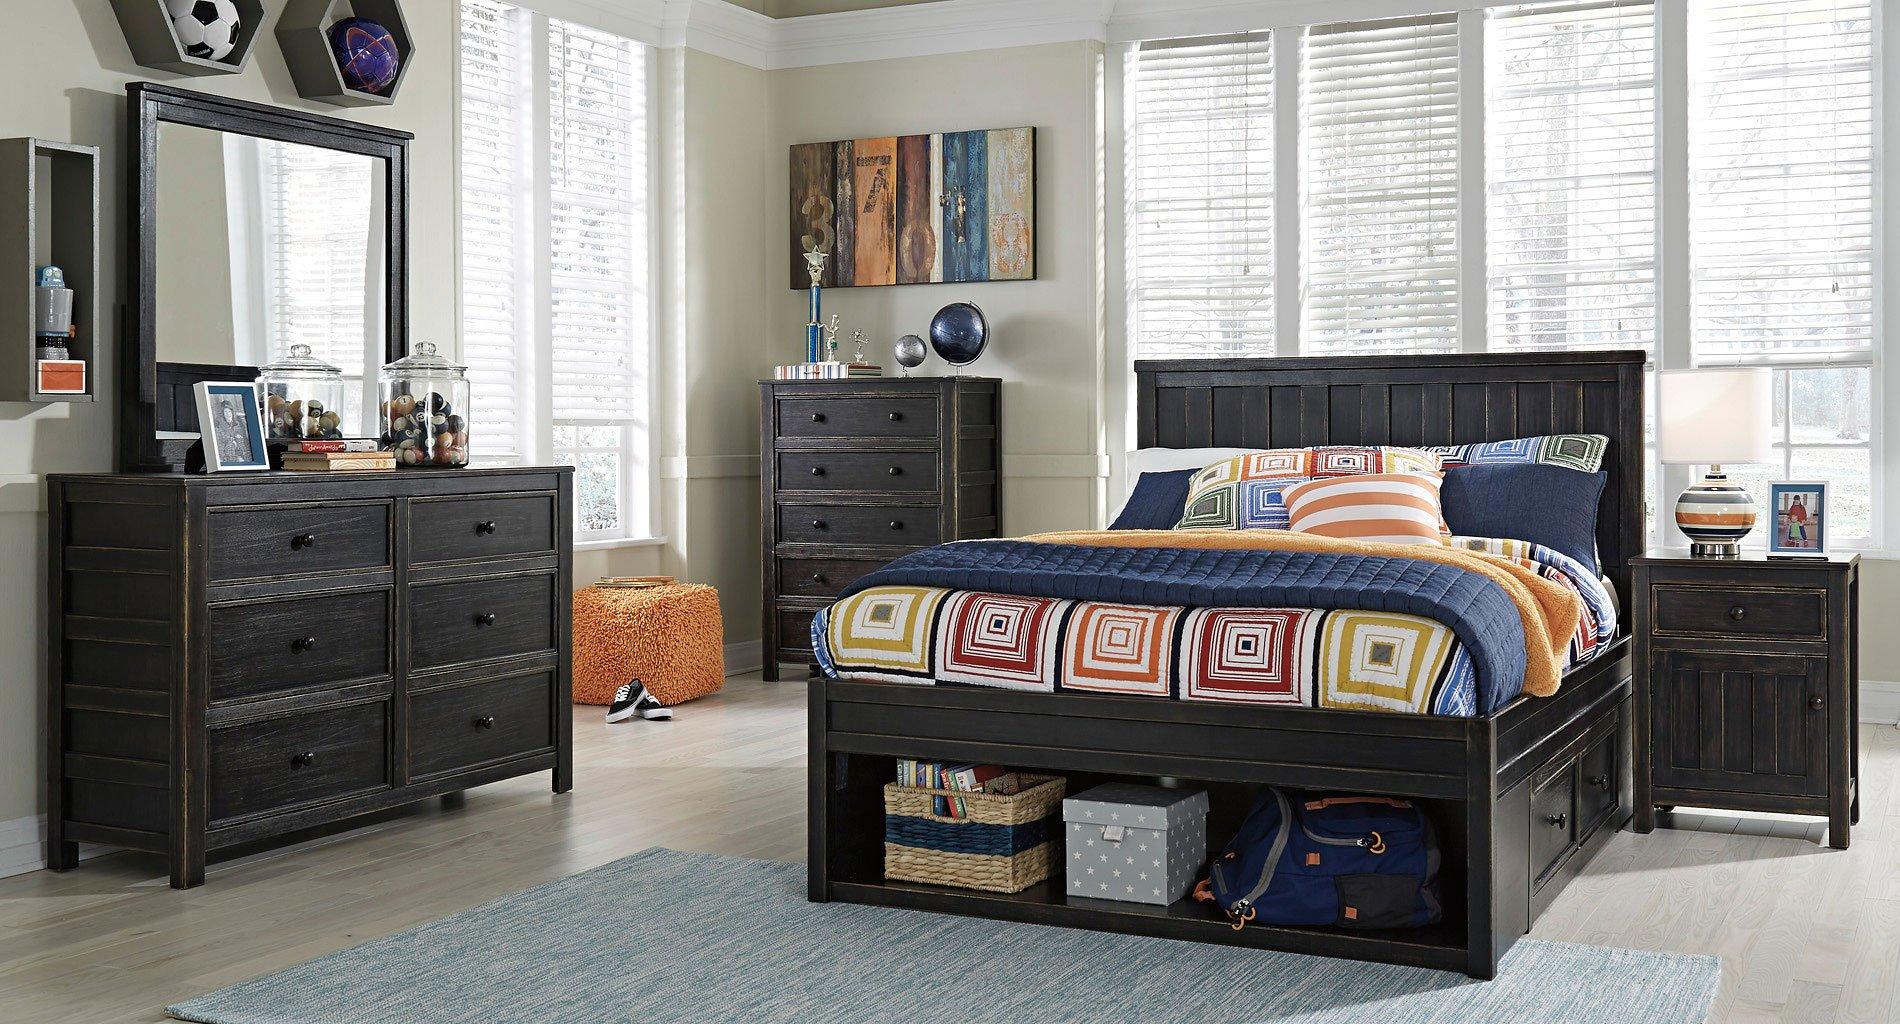 Jaysom youth storage bedroom set signature design - Youth bedroom furniture with storage ...